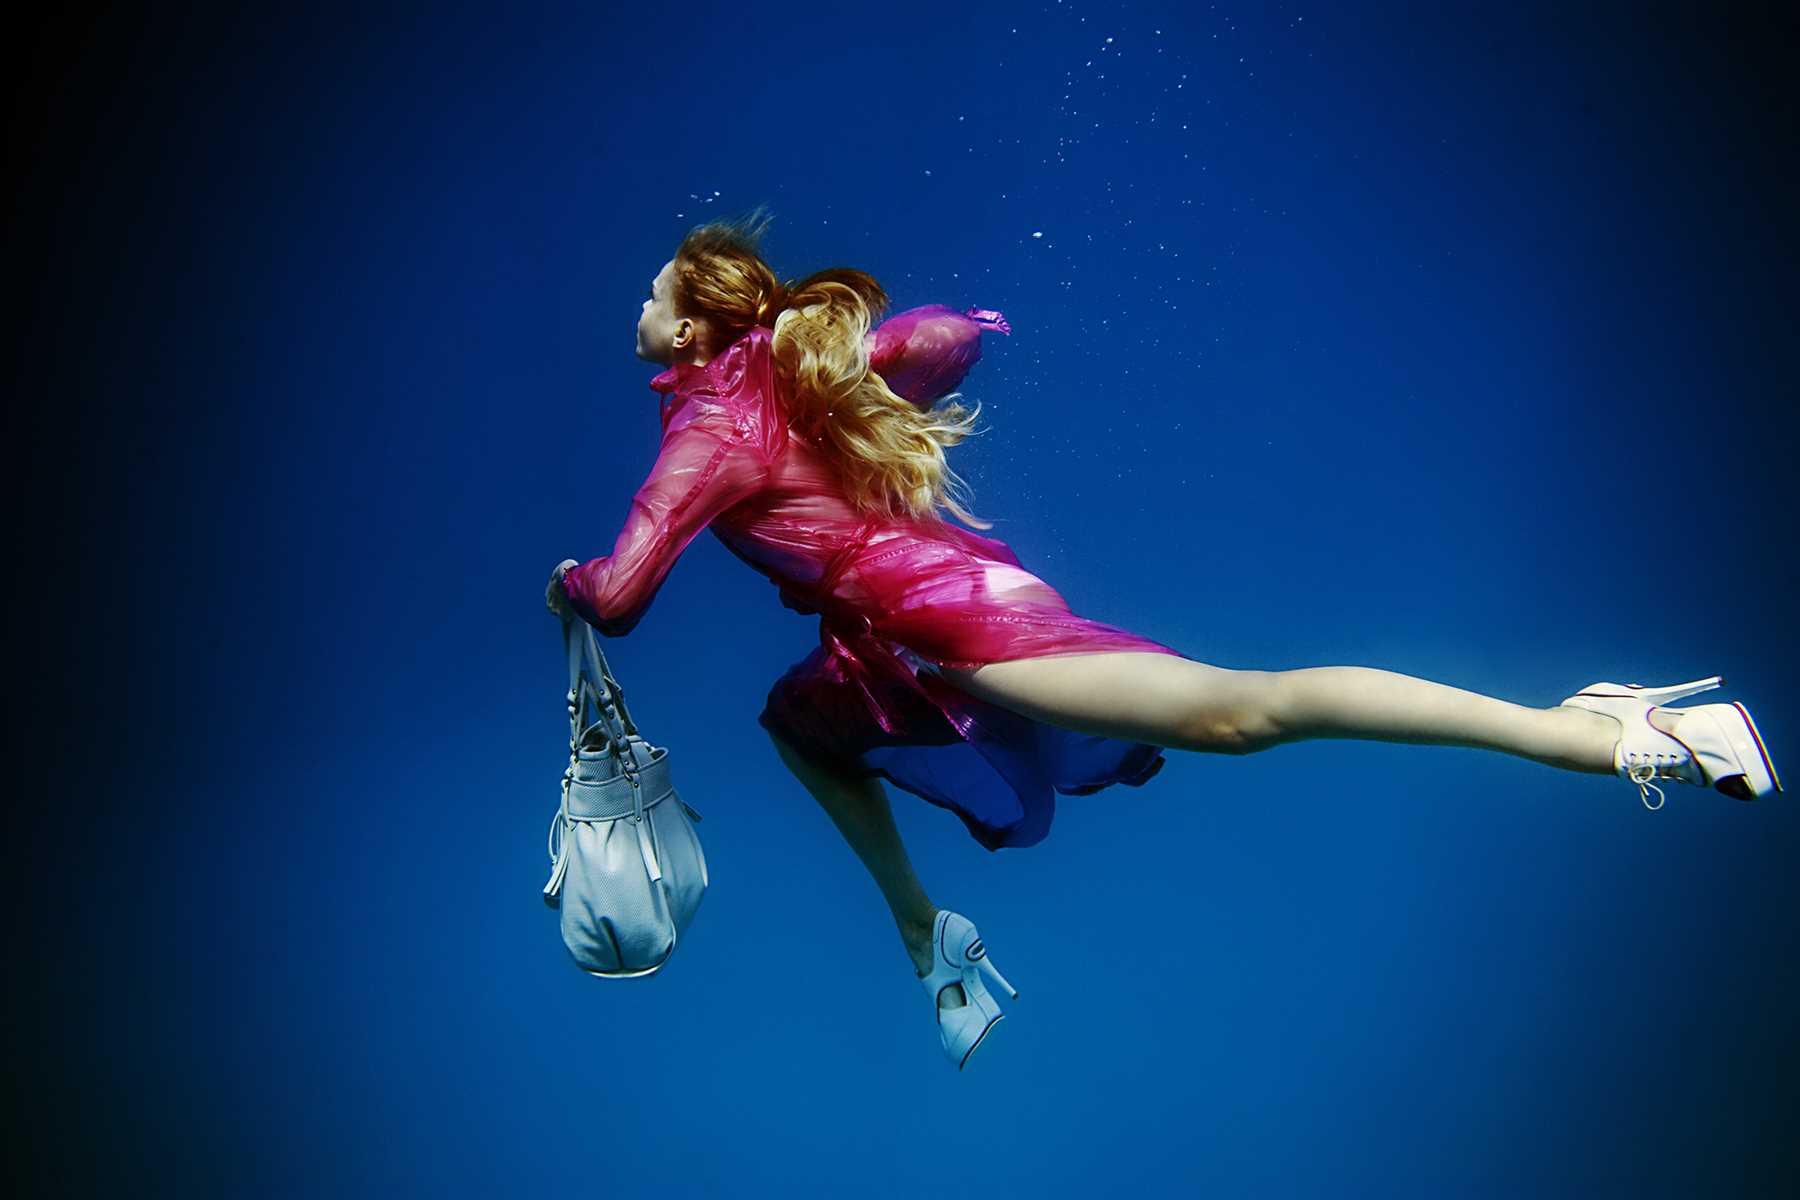 30 Amazing Underwater Photographs - Stockvault.net Blog